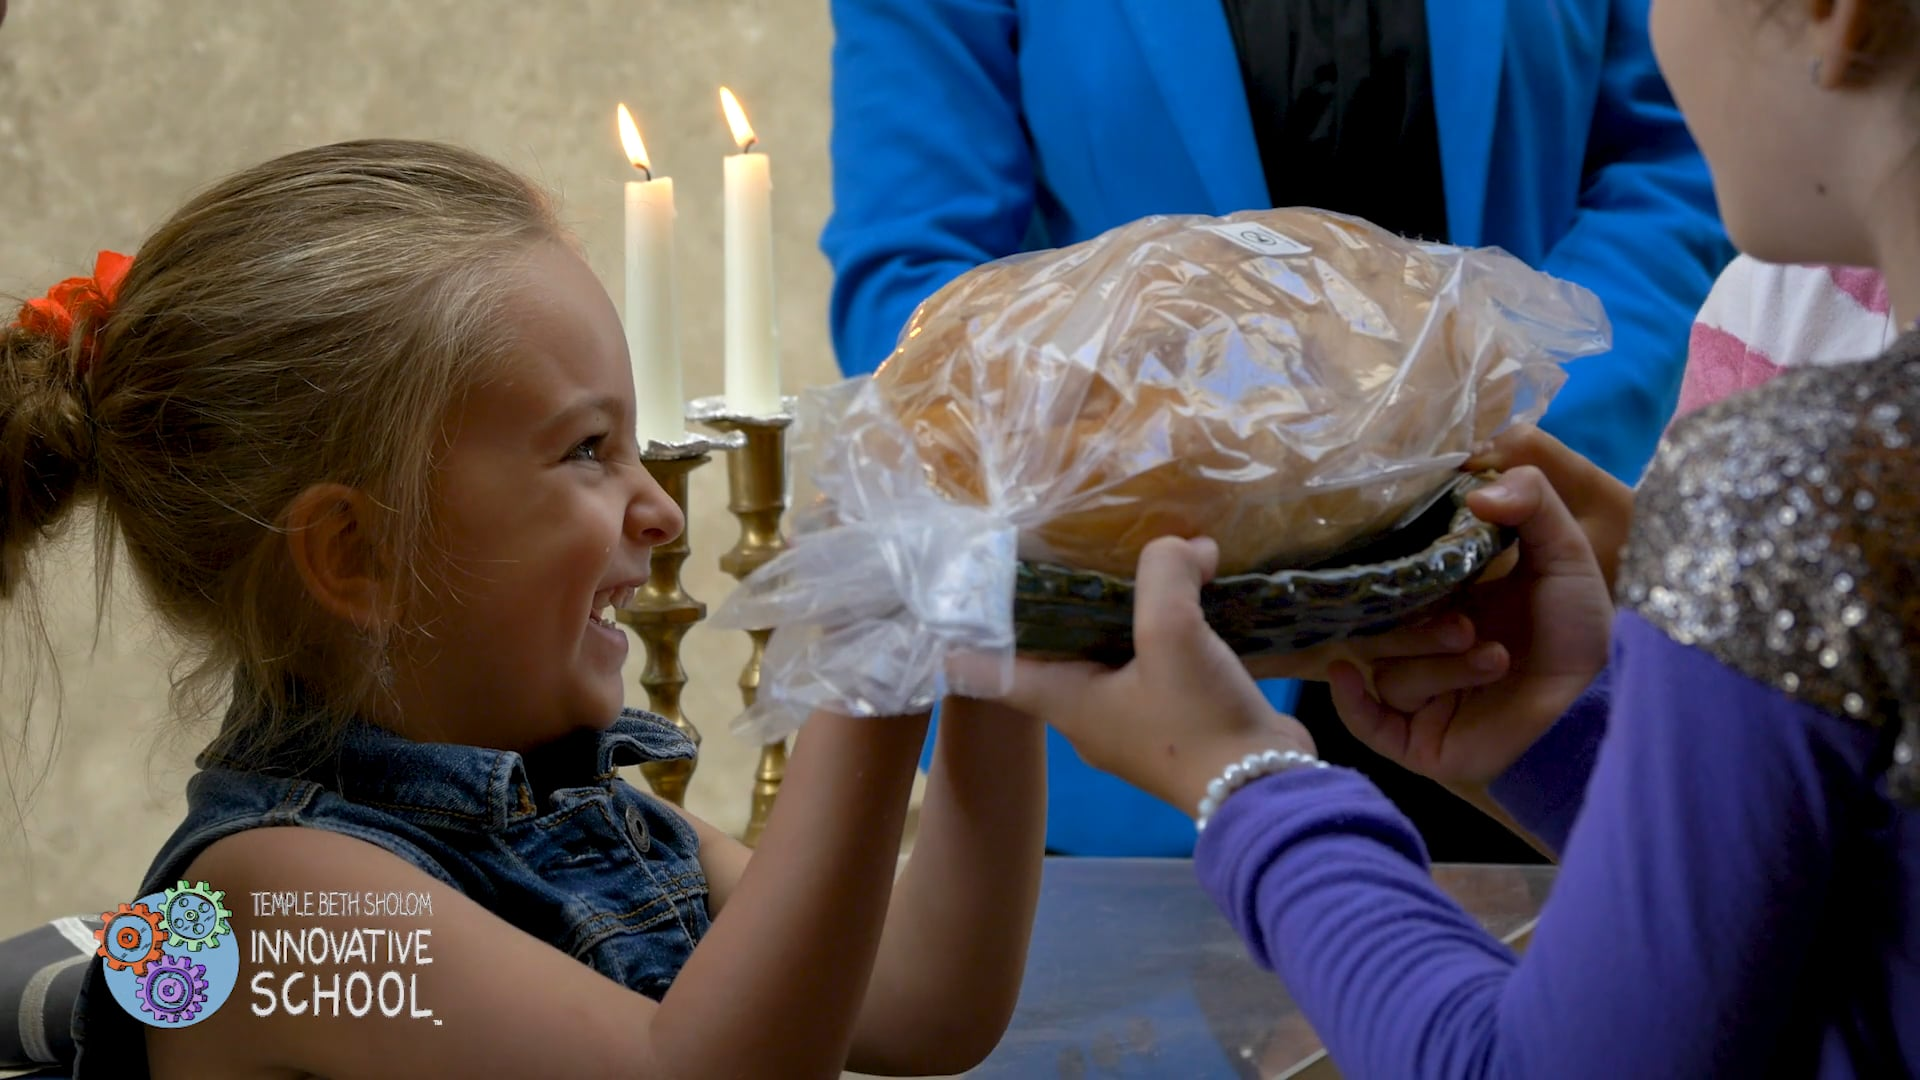 Temple Beth Sholom Innovative School: Elementary Level